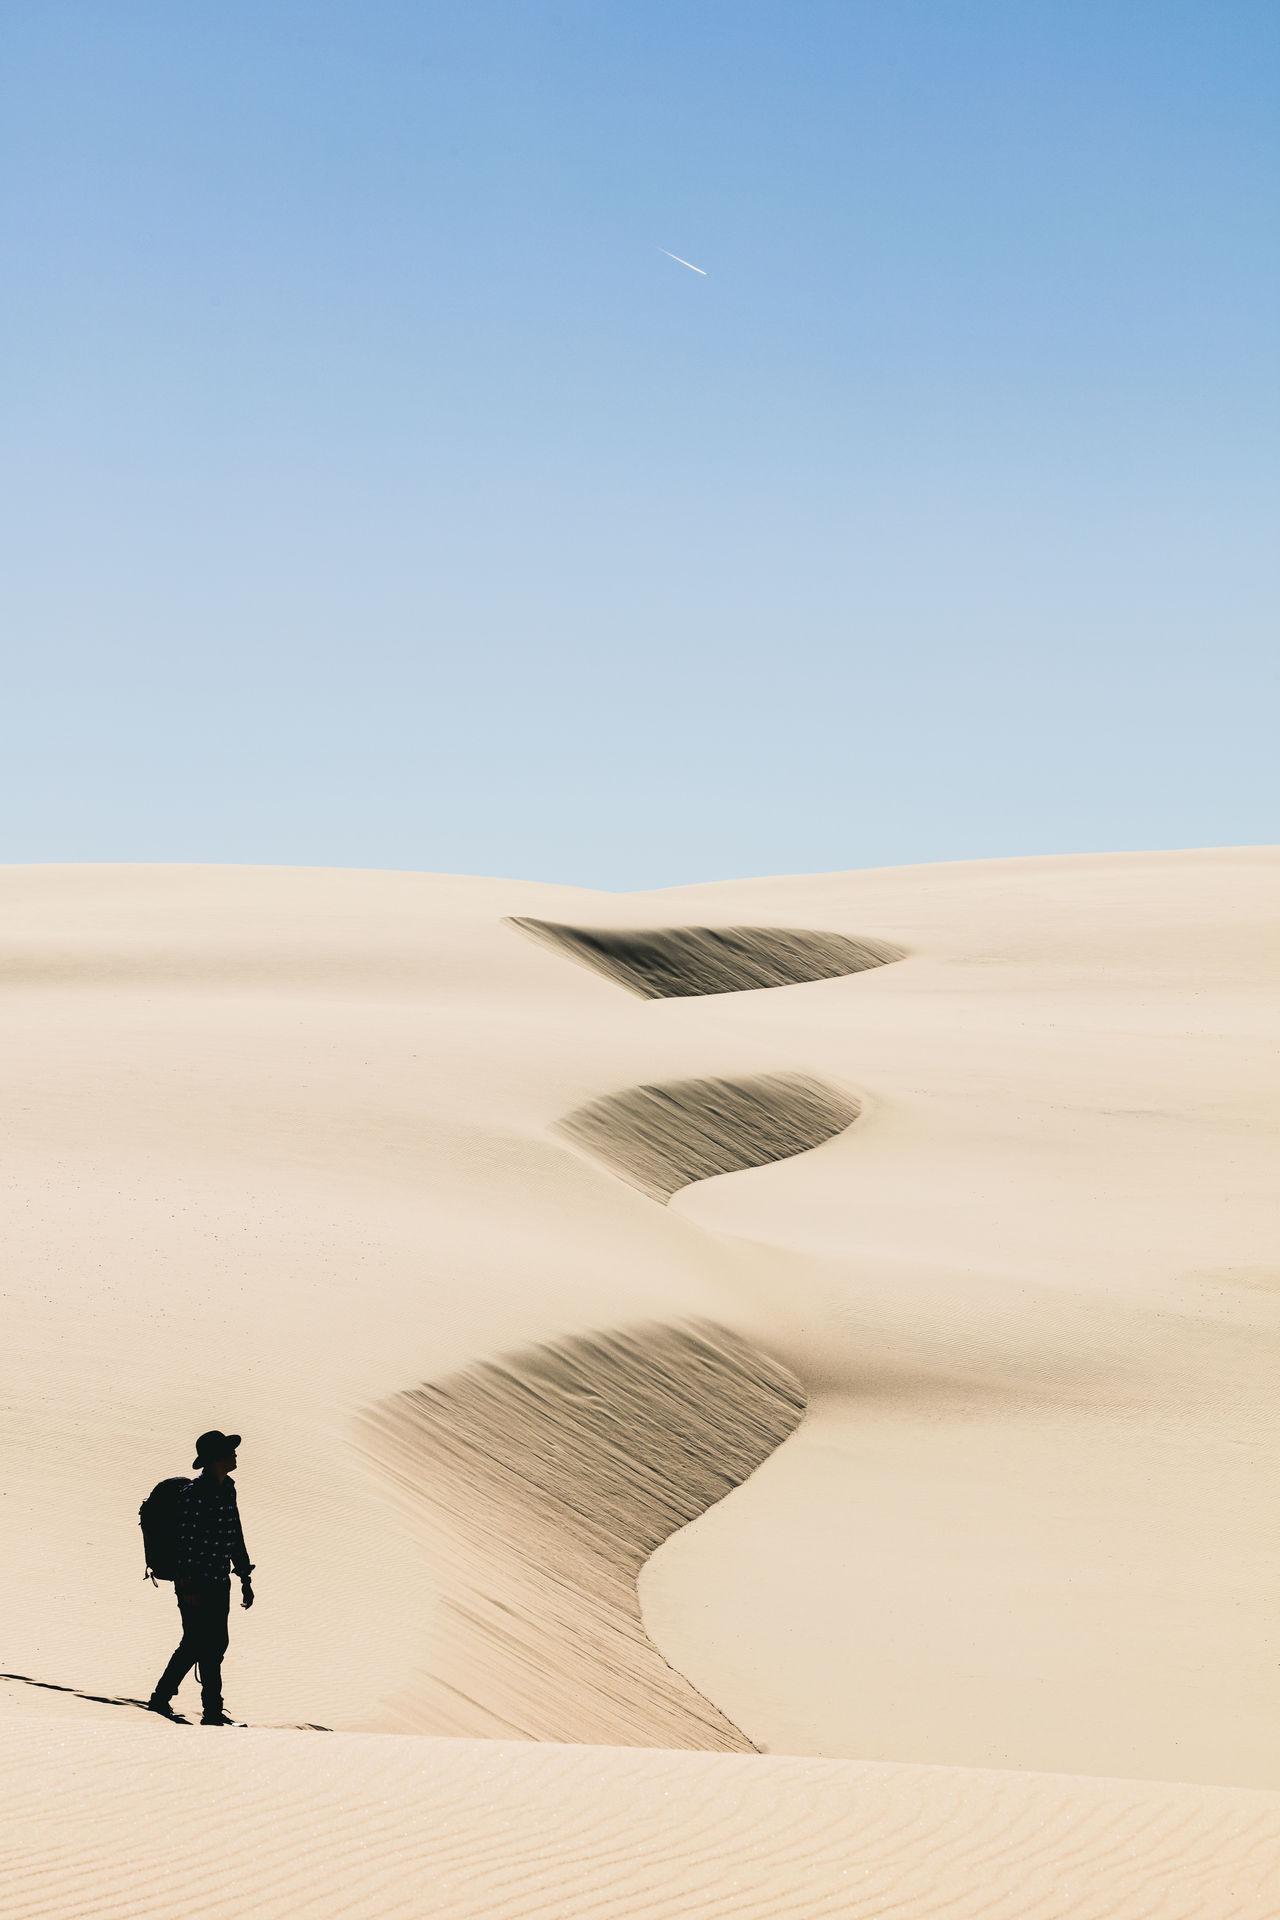 Man walking in desert against clear sky